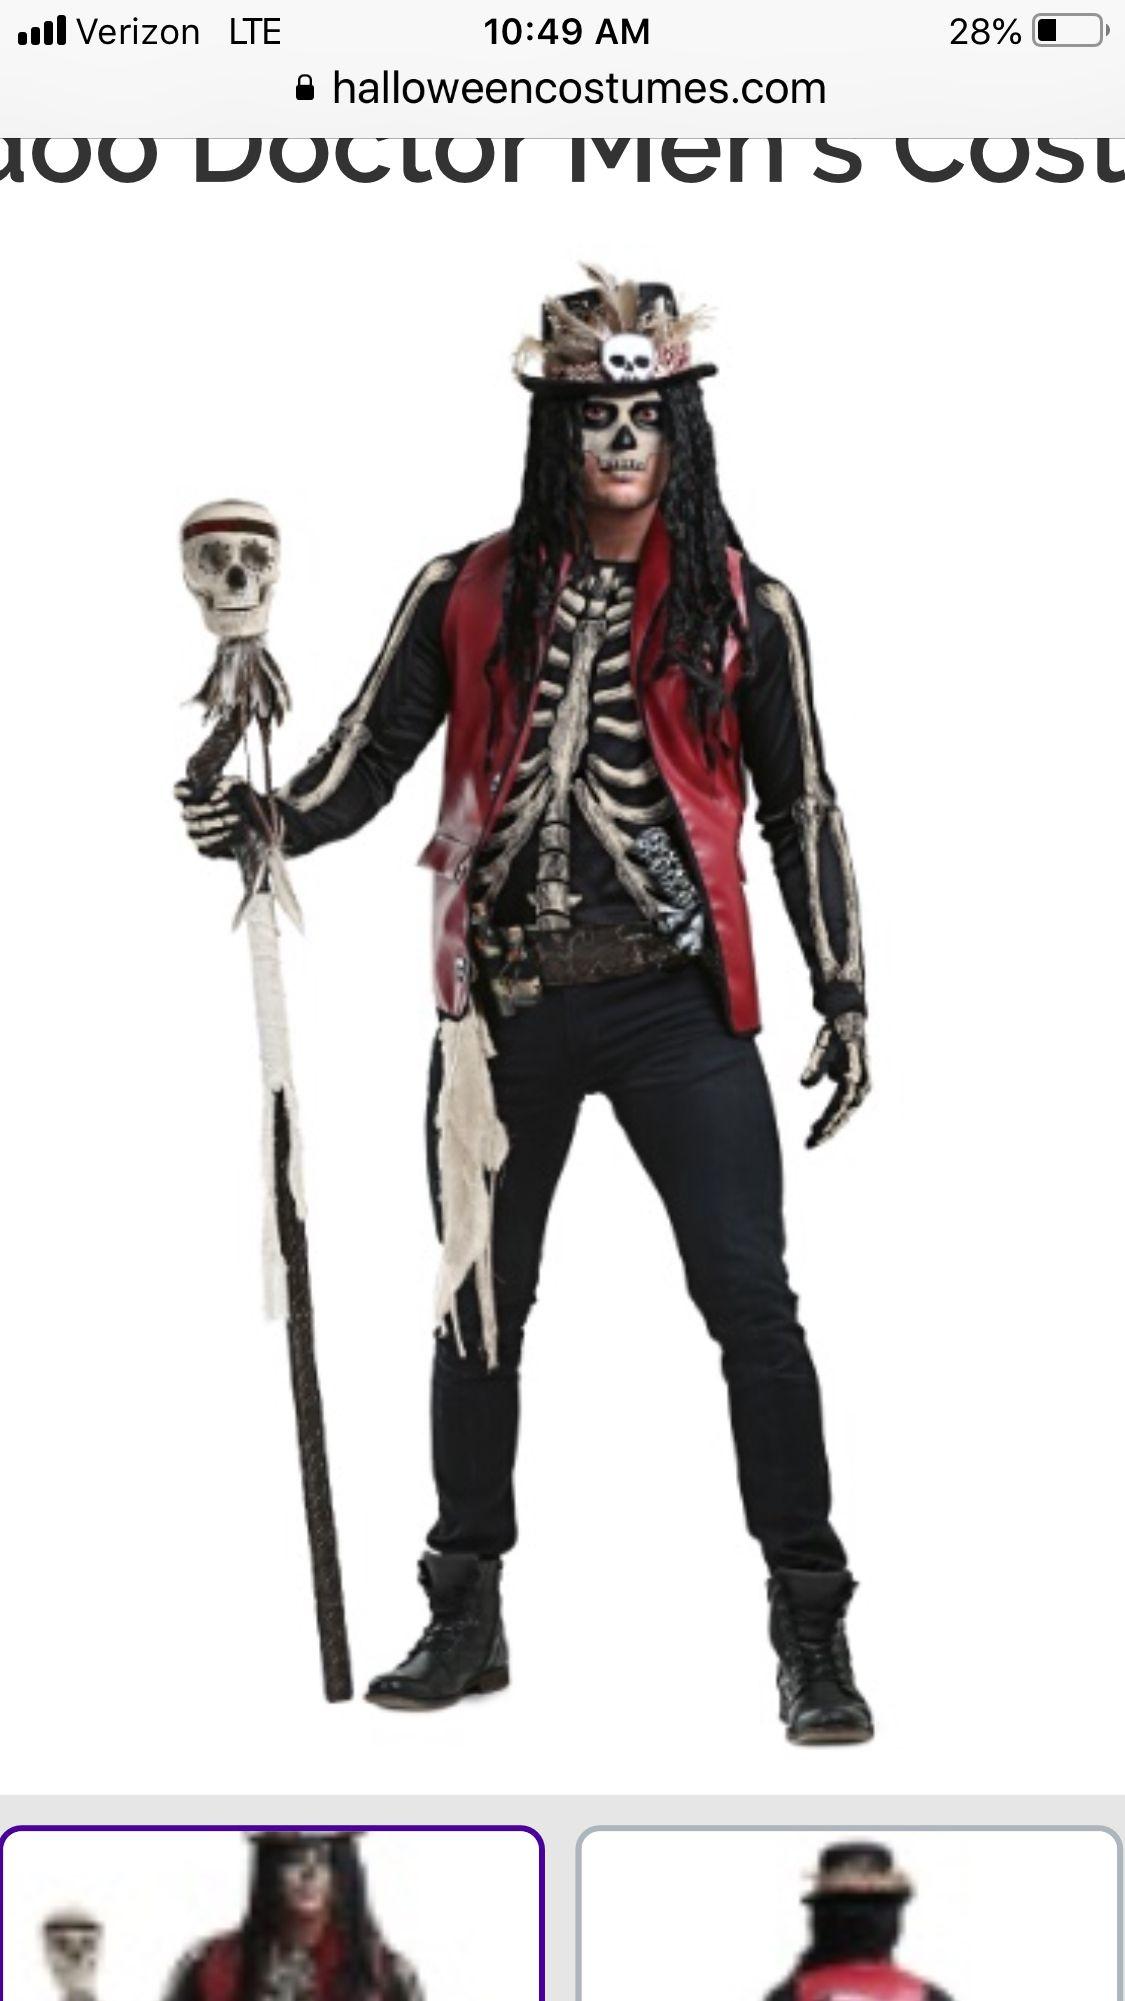 Medina Halloween 2020 Pin by Wendy Milligan Medina on Halloween in 2020 | Doctor costume